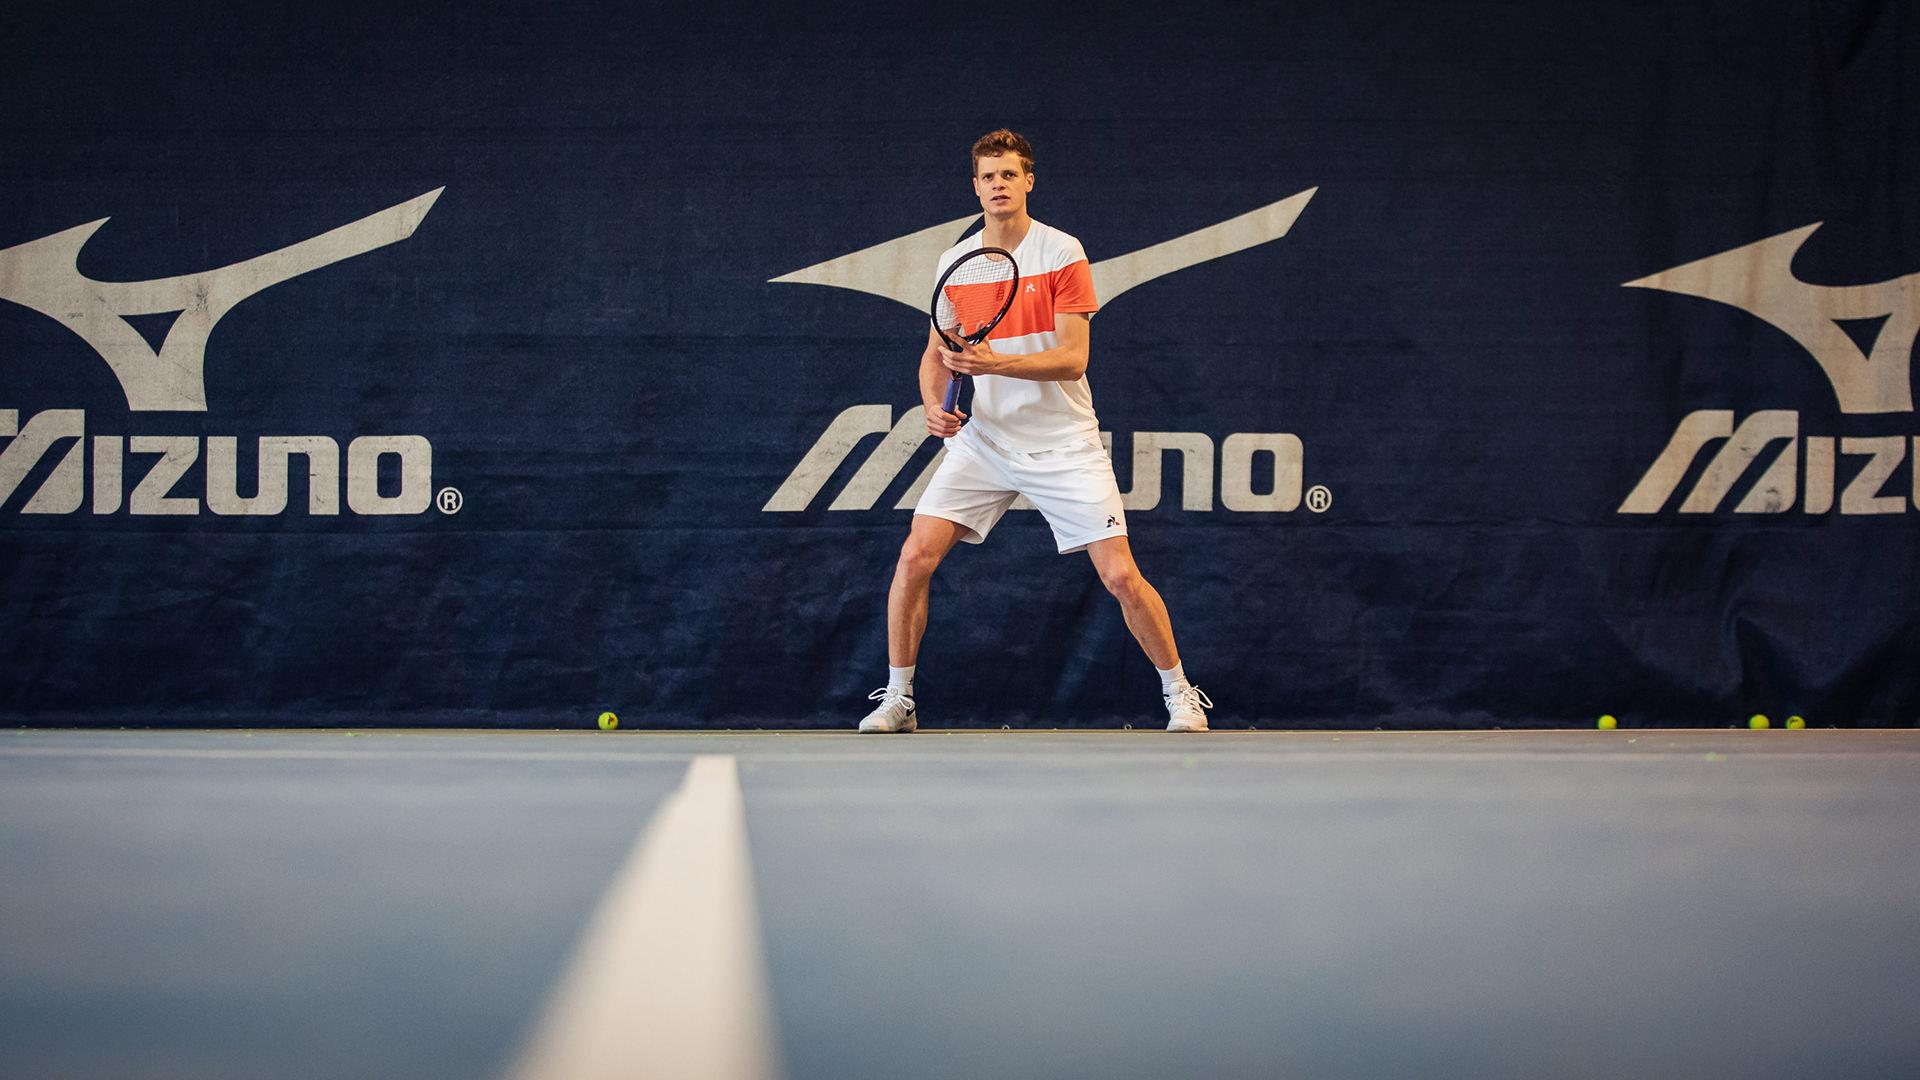 tennis-spiel-profi-feld-yannik-hanfmann